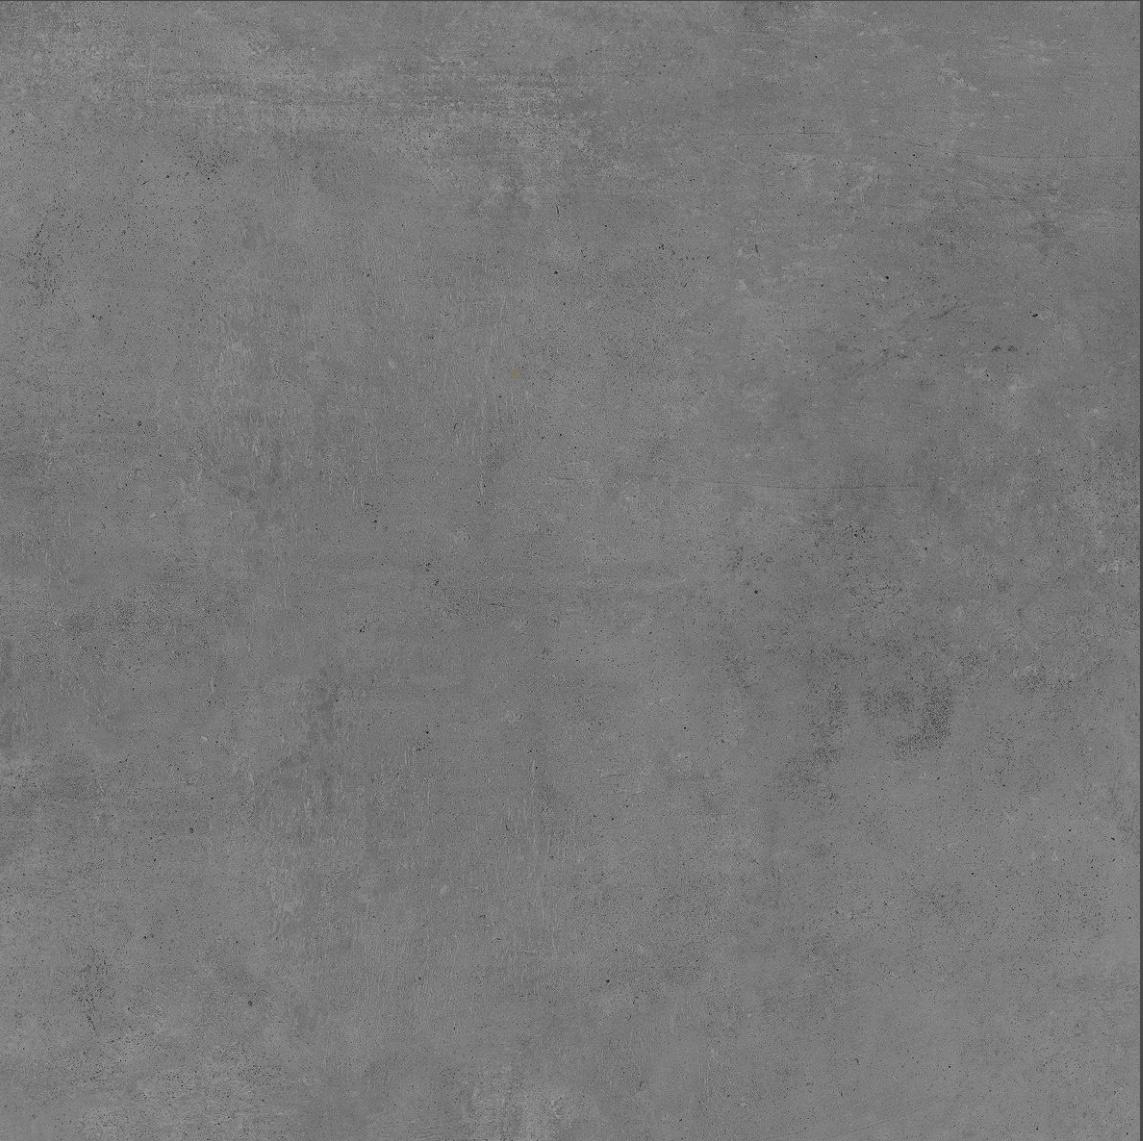 luxury tiles xl venice charcoal stone effect anti slip porcelain floor tile 1000x1000mm